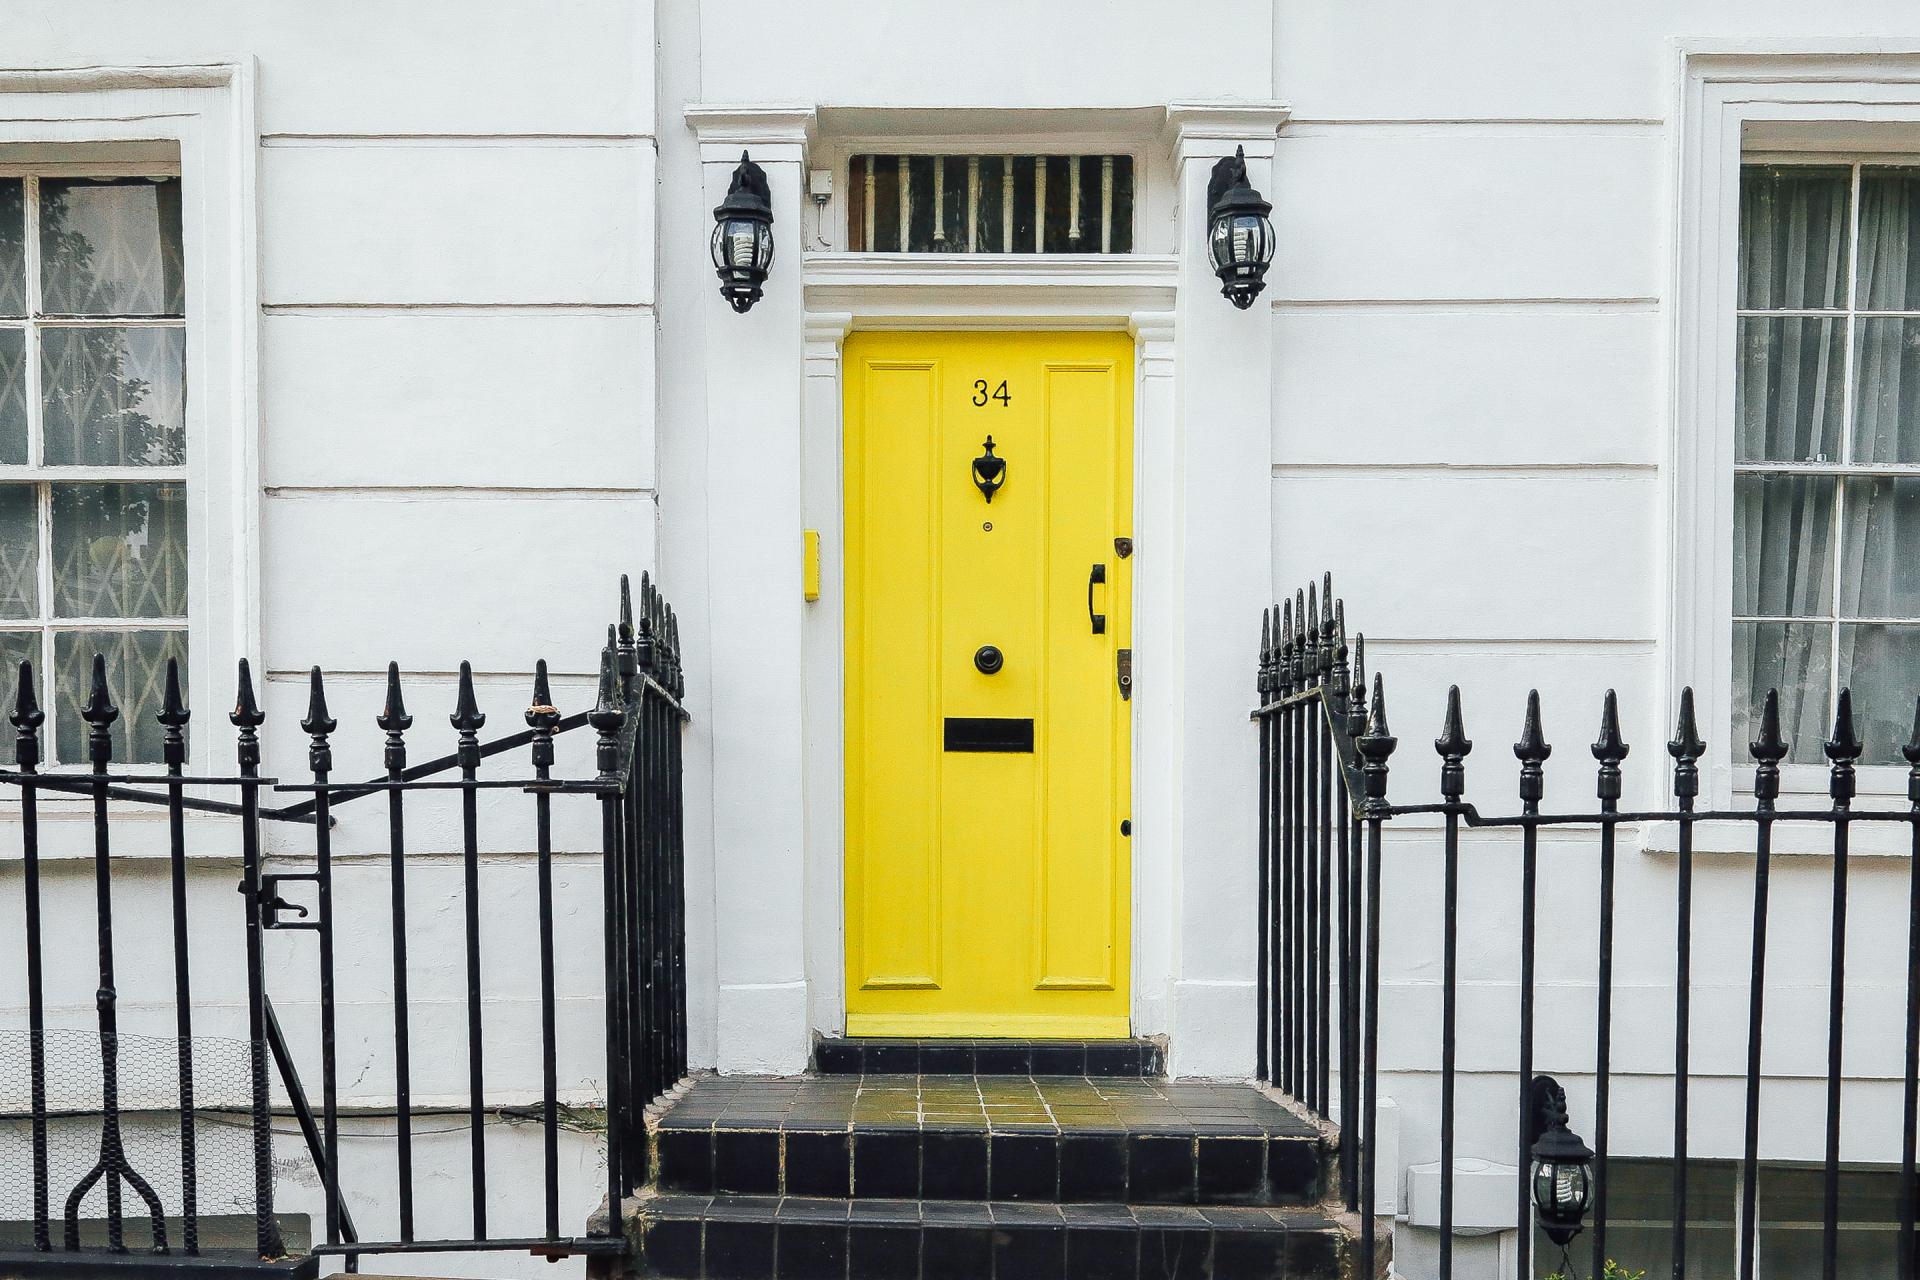 IAEE 2017 Abstract - Property Ireland